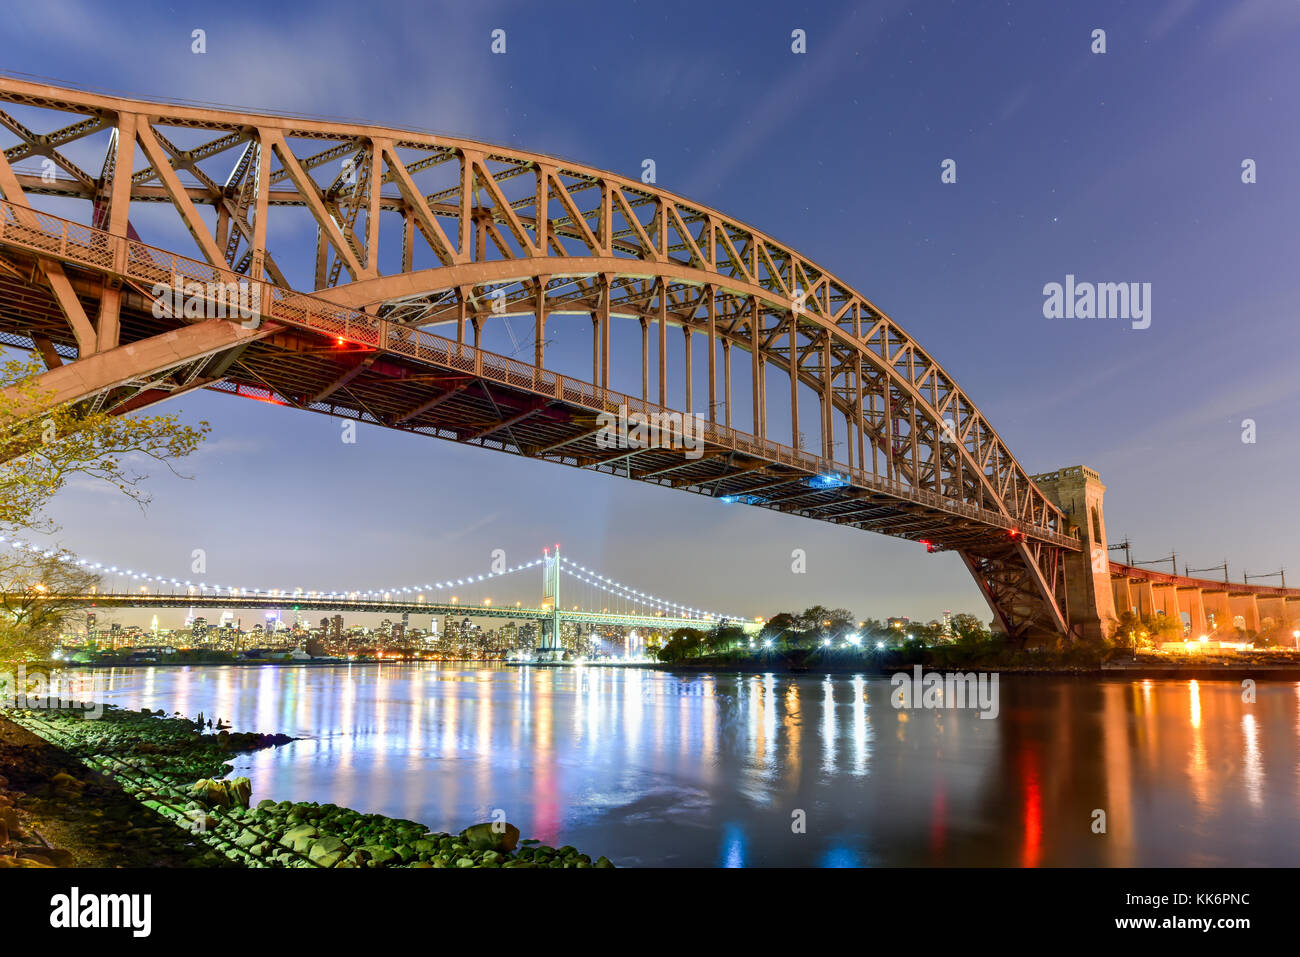 Hell Gate Bridge and Triboro Bridge at night, in Astoria, Queens, New York. - Stock Image